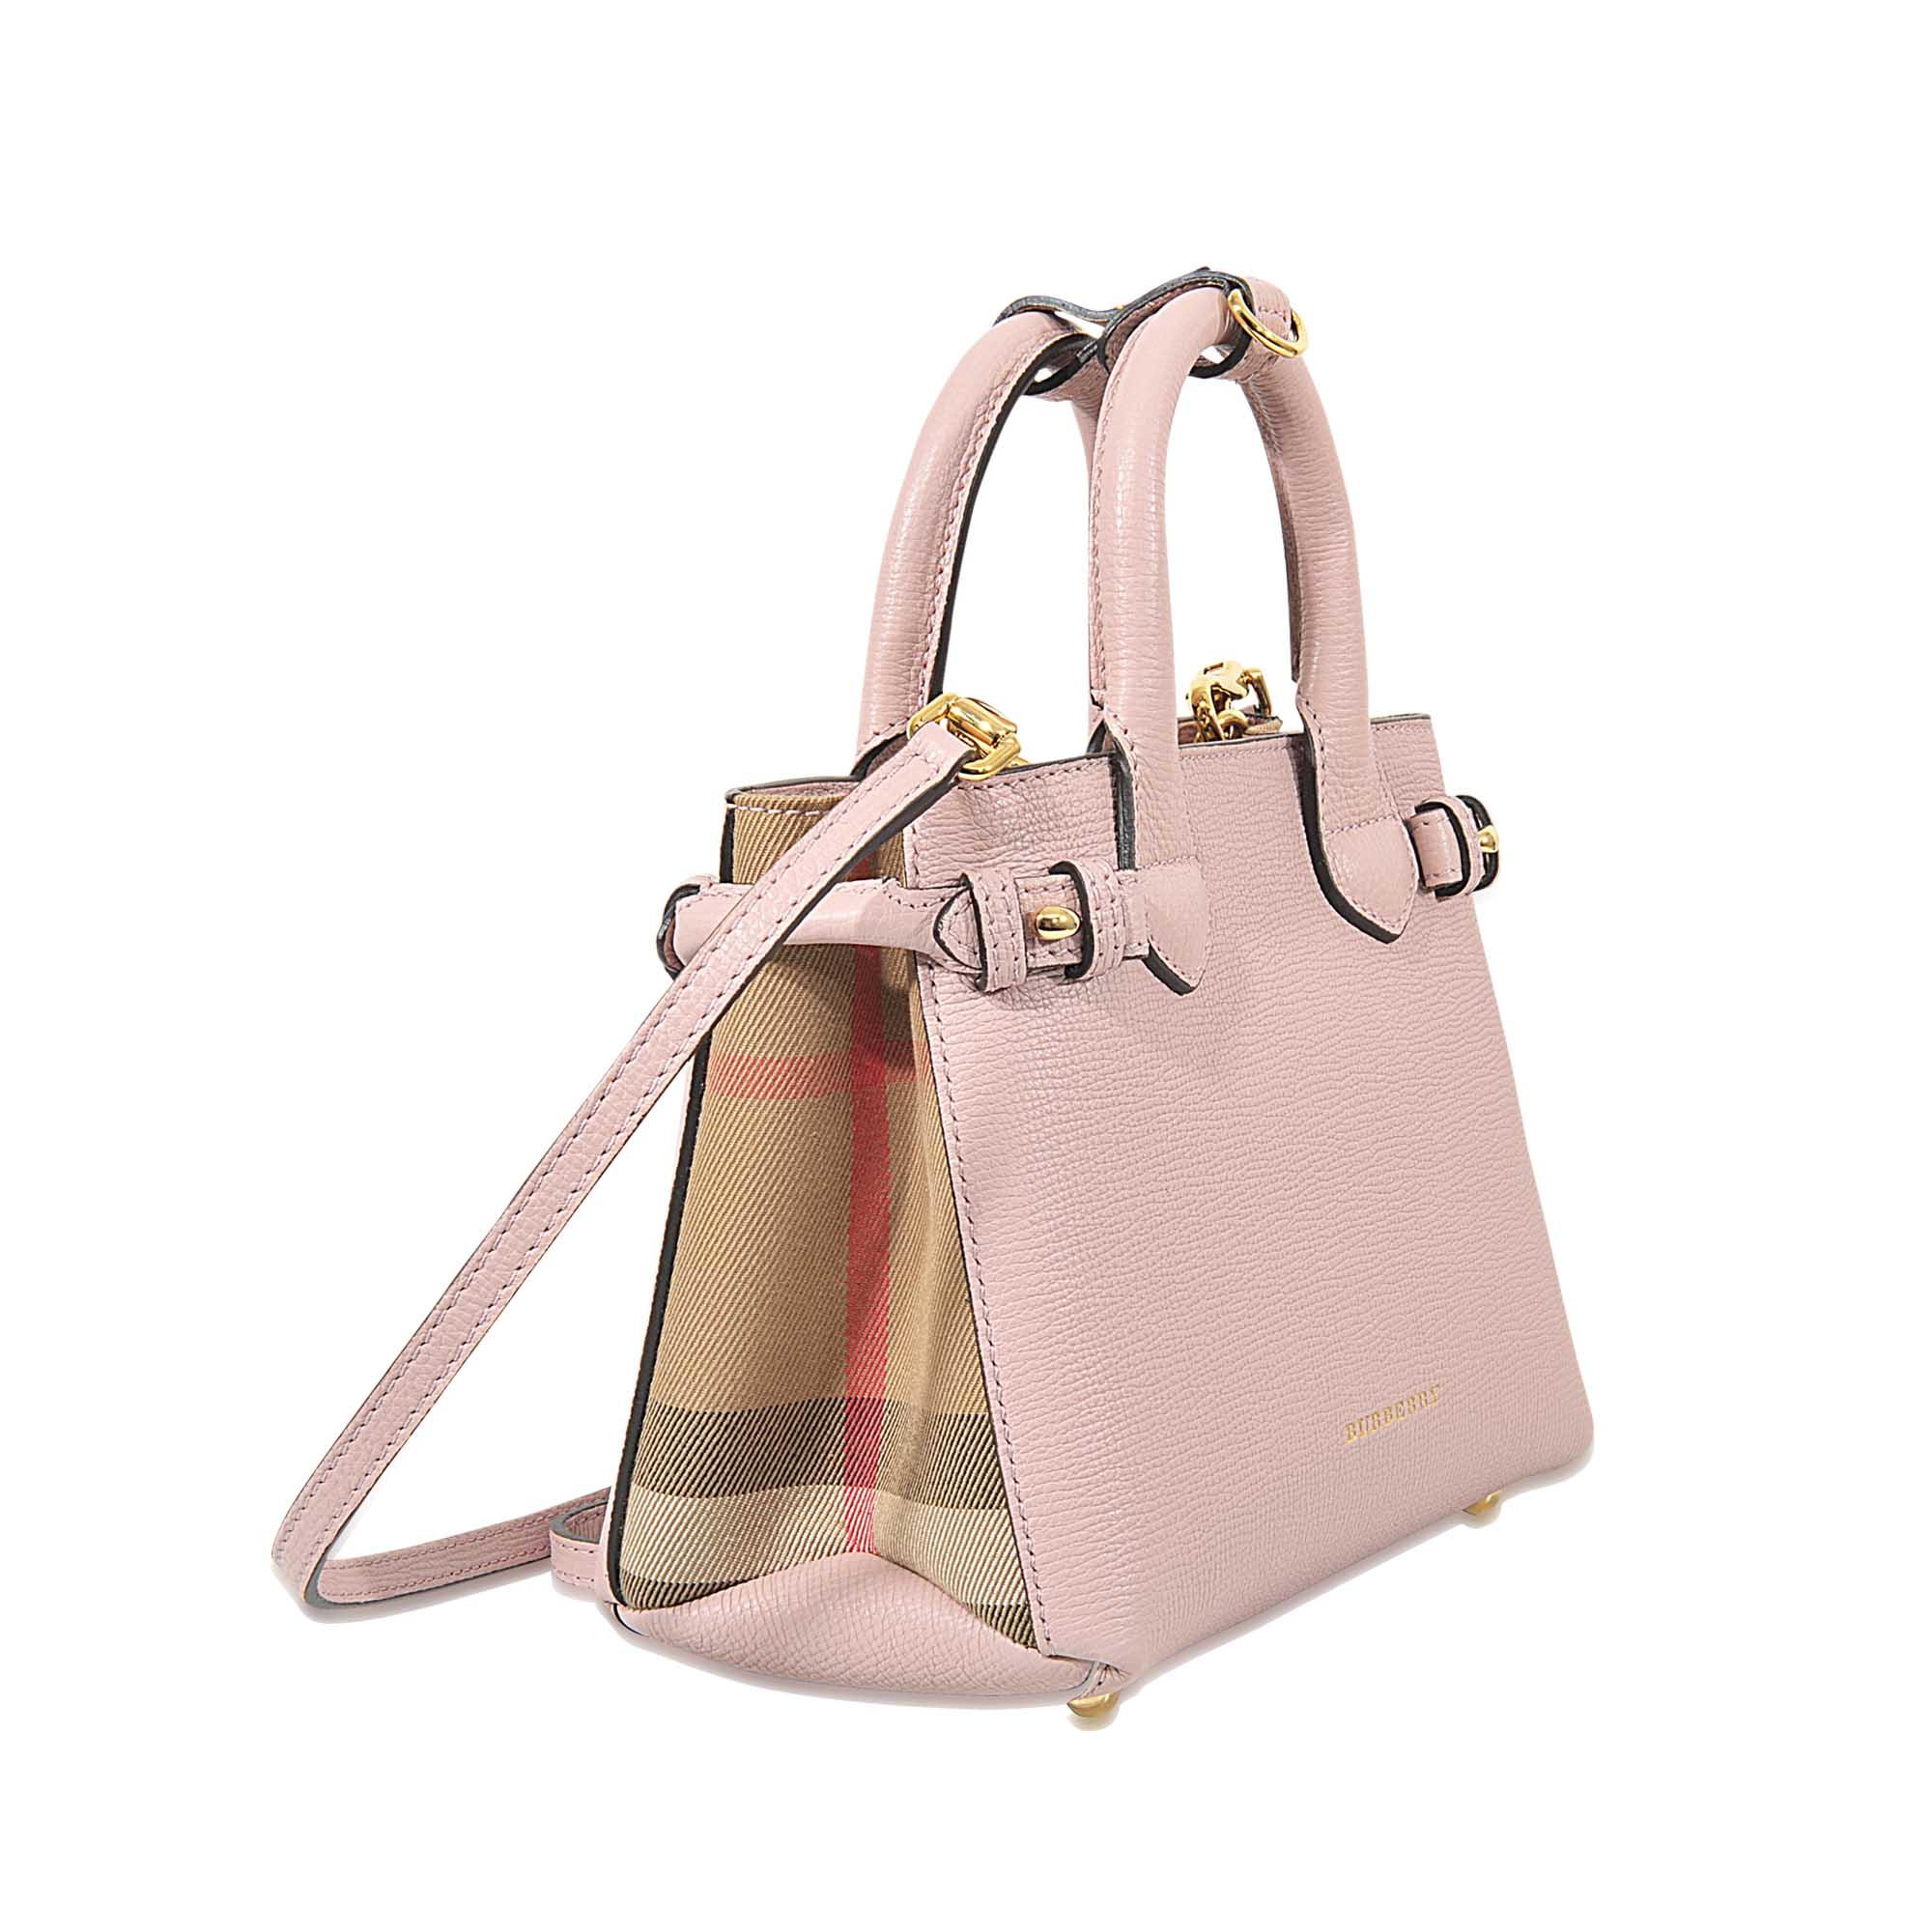 Burberry Pink Handbag - HandBags 2018